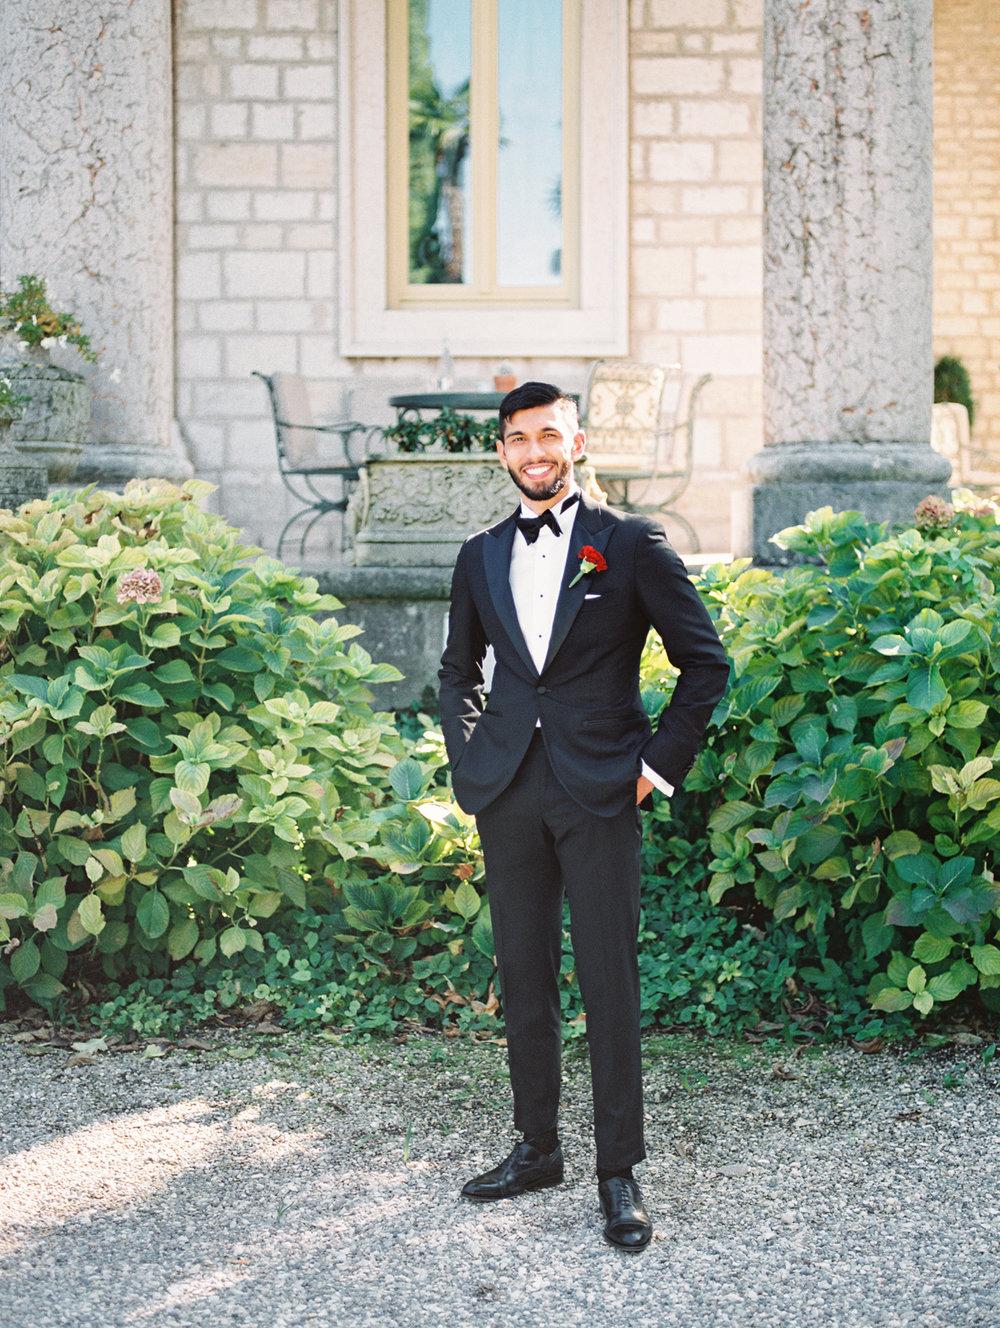 Palace_Villa_Cortine_Hotel_Italian_Wedding_Photographer_Sirmione_AKP-8-Mitchell_Kapoor.jpg